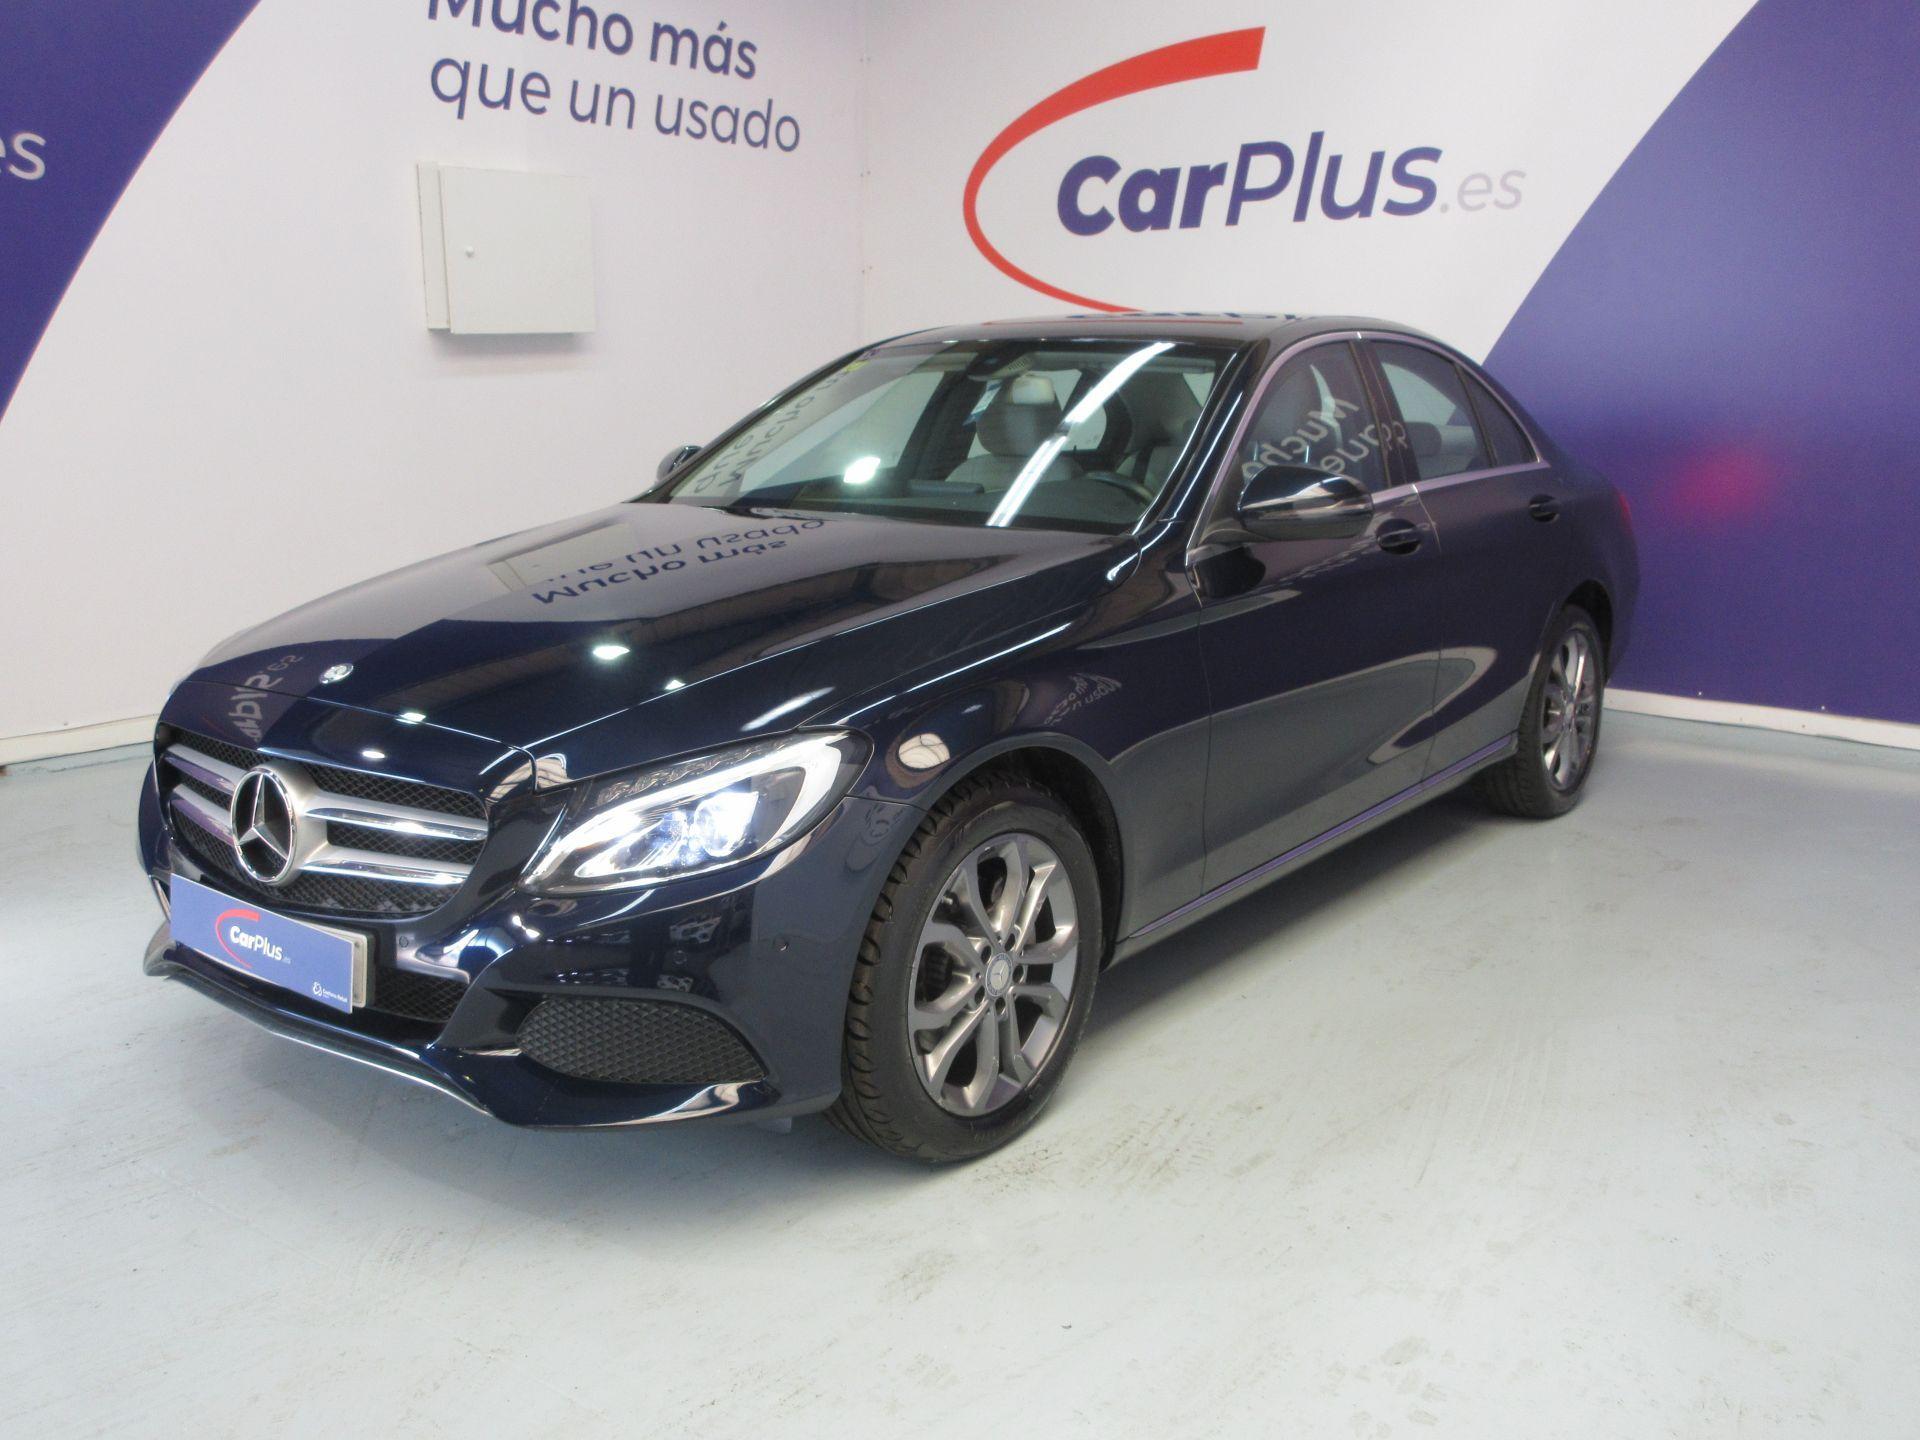 Mercedes Benz Clase C ocasión segunda mano 2017 Diésel por 24.990€ en Madrid